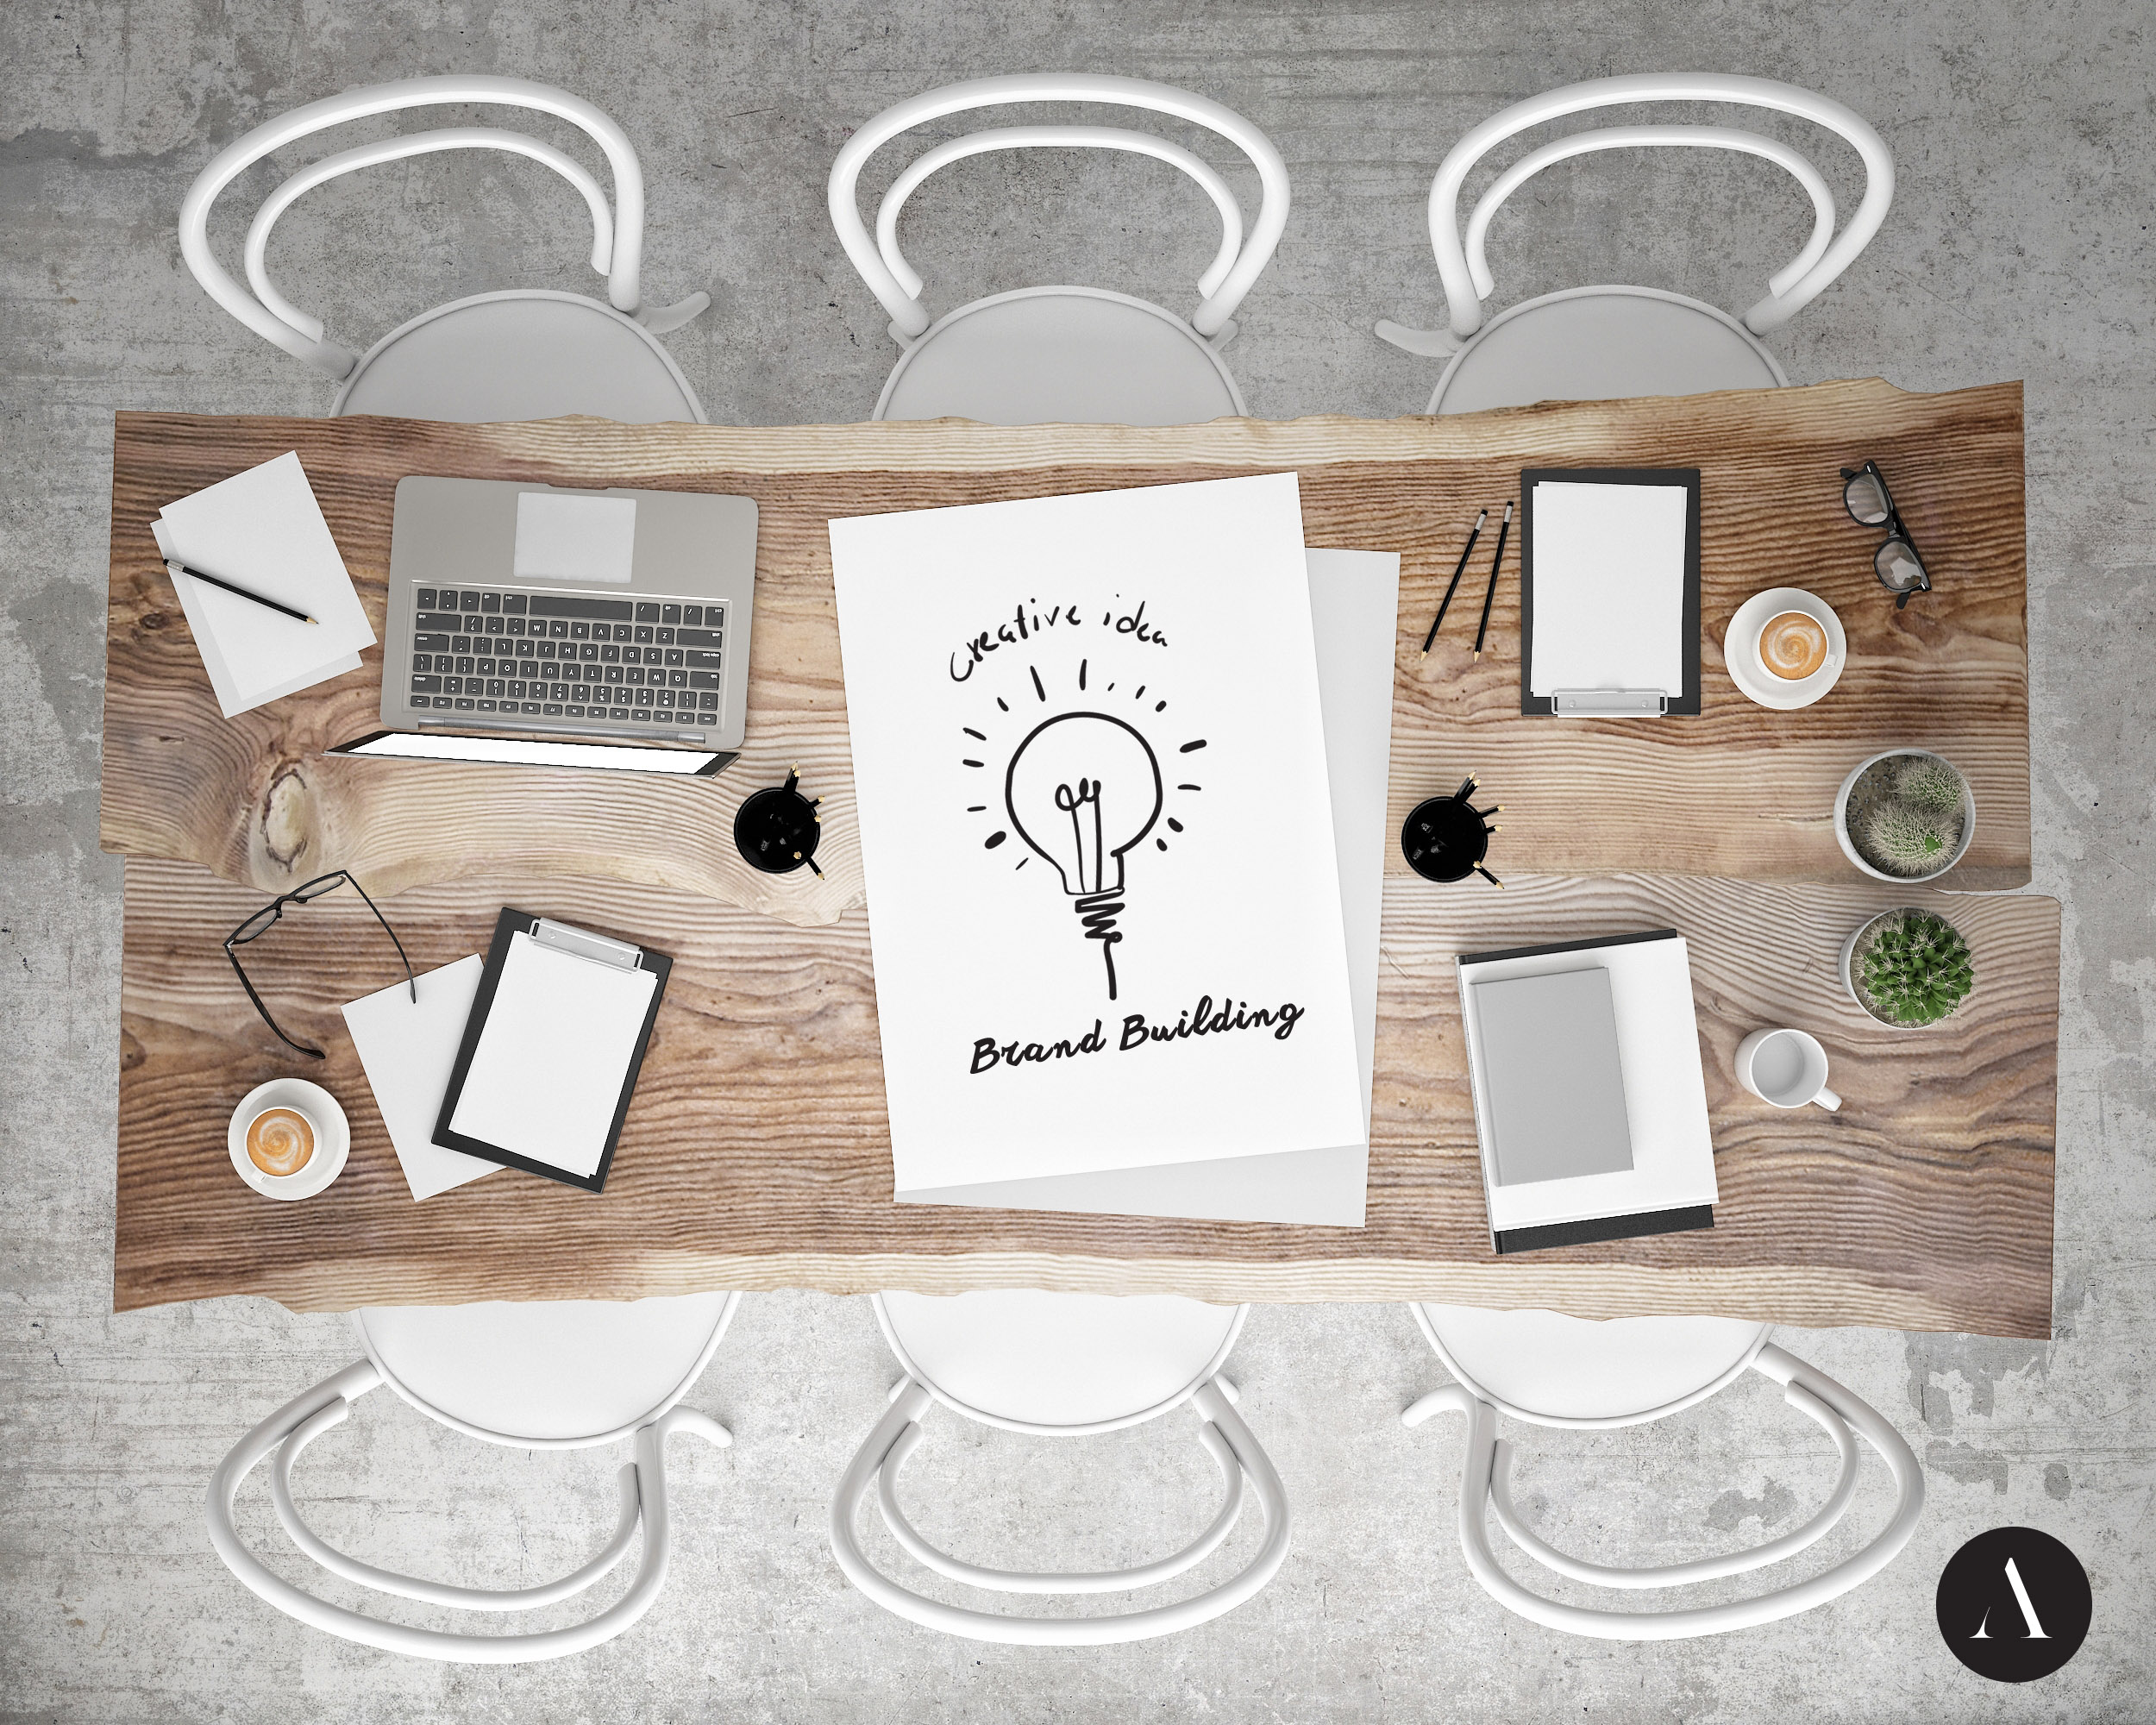 Brand Building Allure Creative.jpg